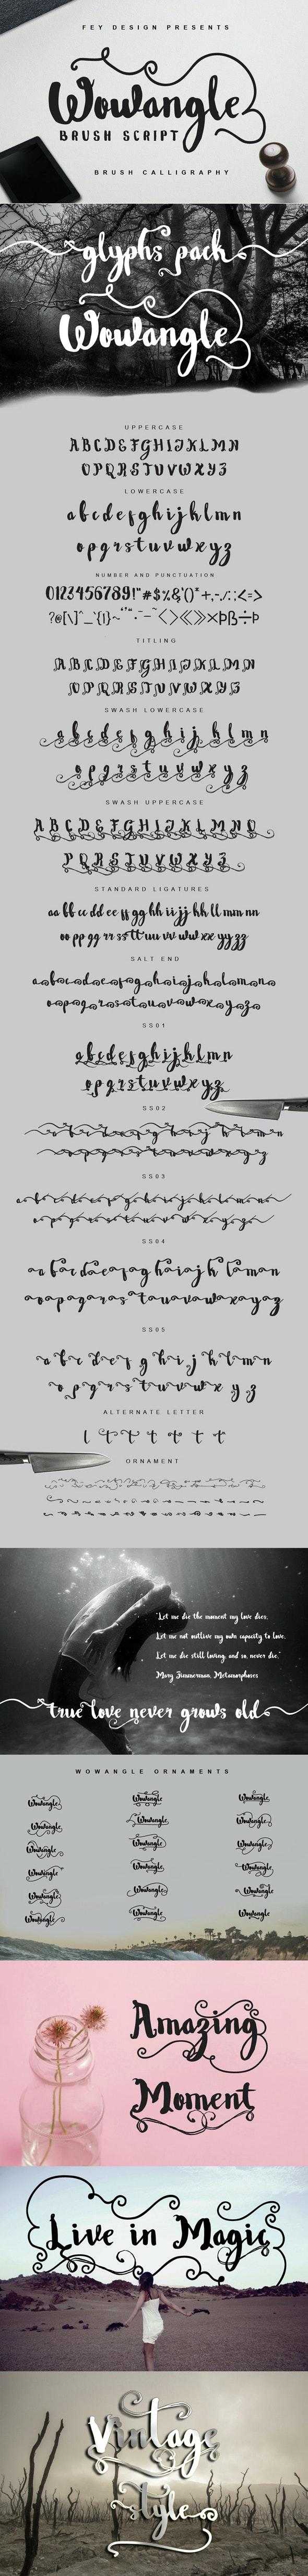 Wowangle Brush Script Font - Hand-writing Script